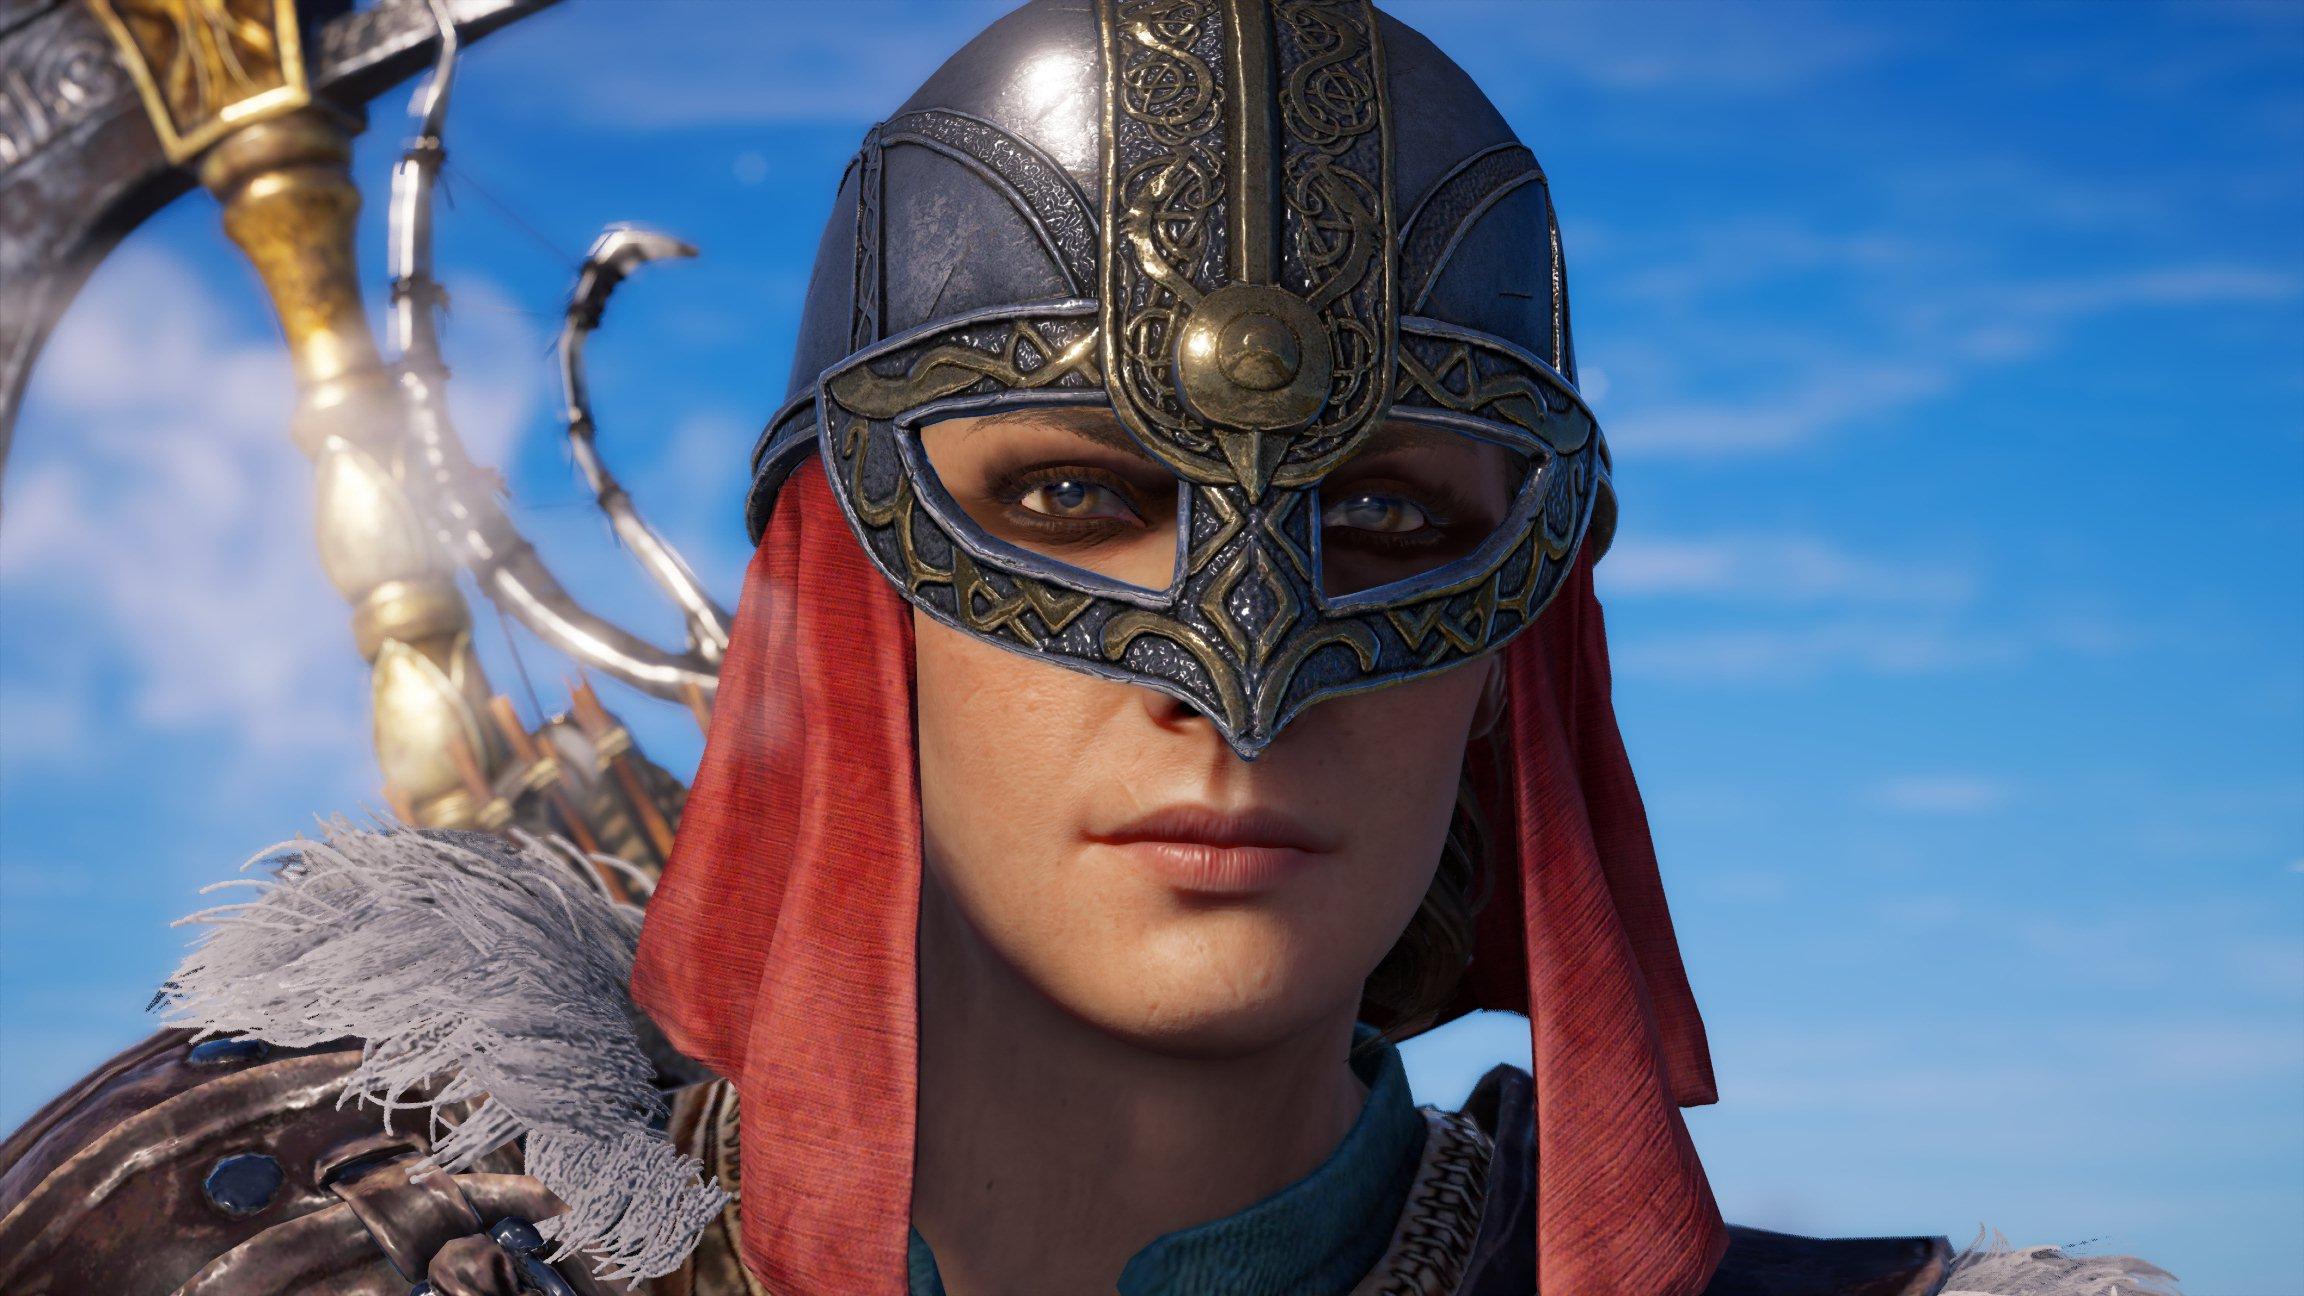 2020088033531.jpg - Assassin's Creed: Odyssey